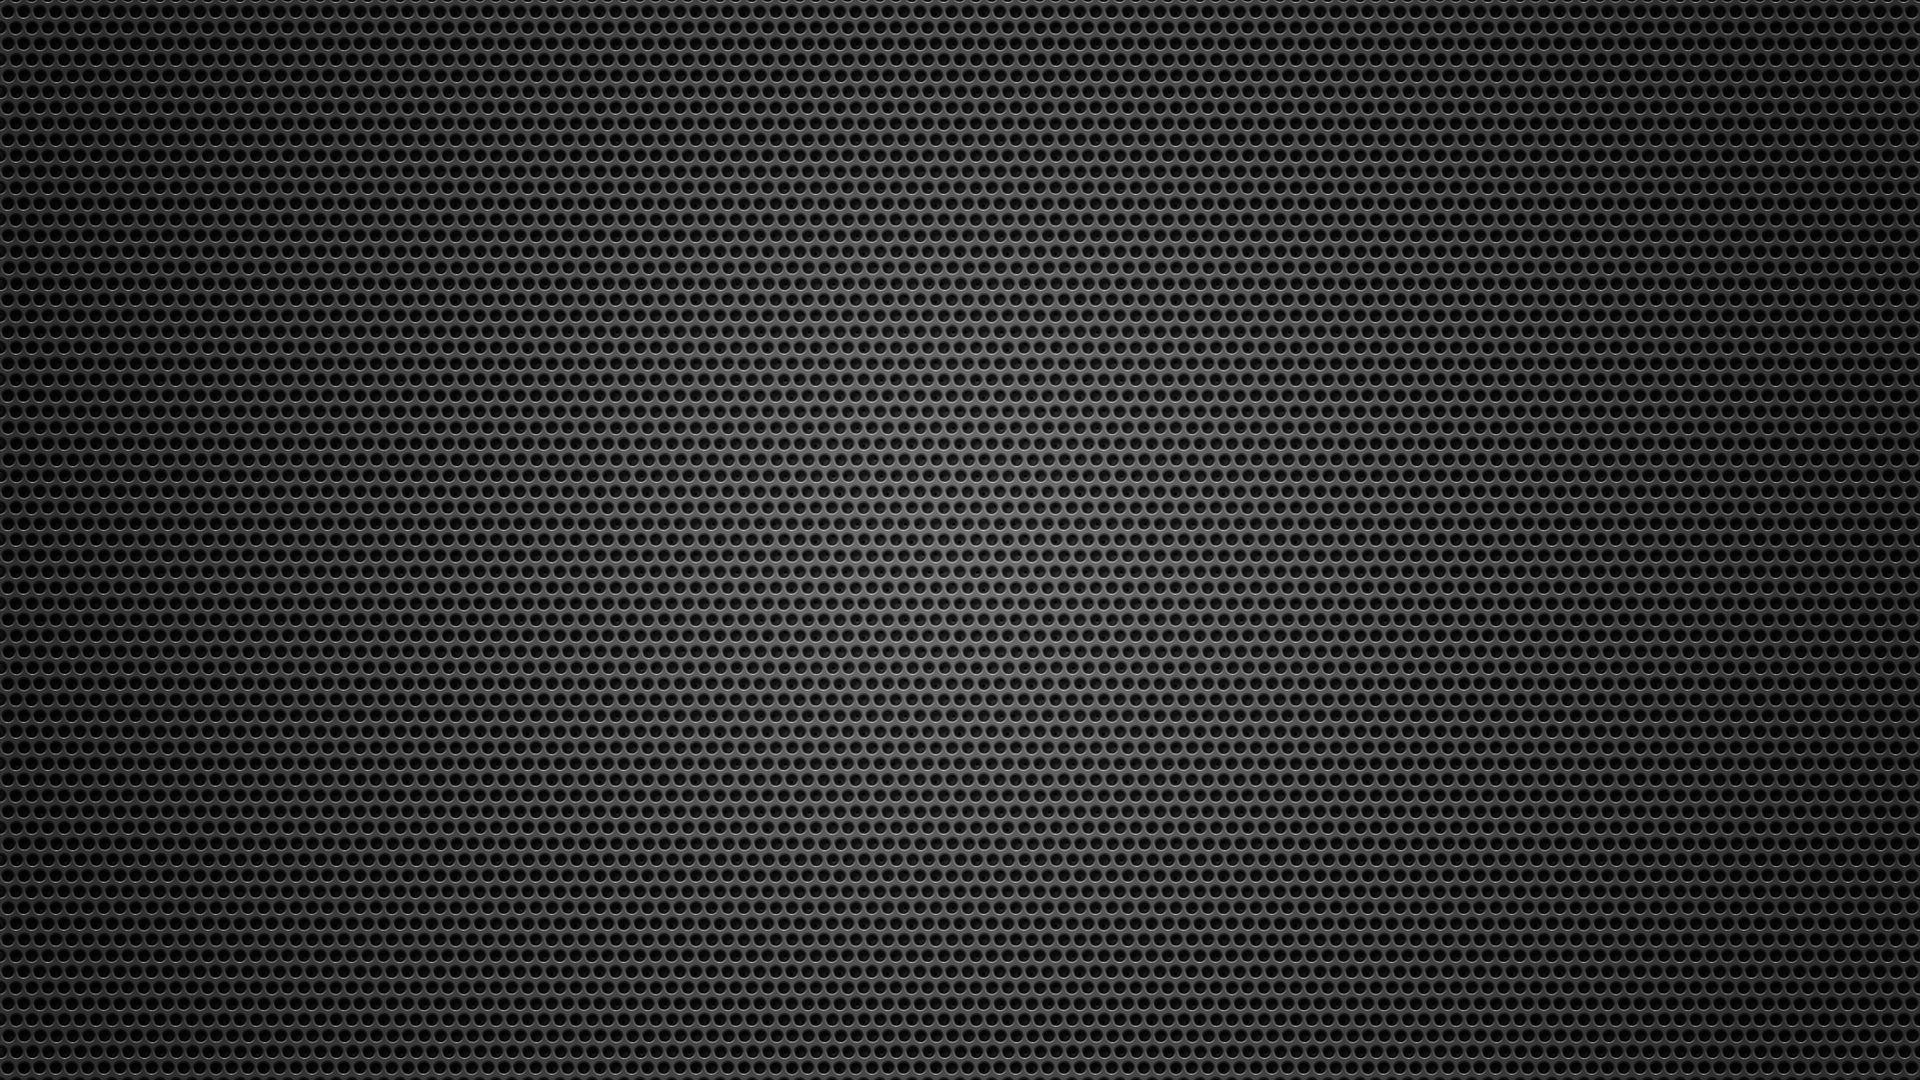 Carbon Fiber Image